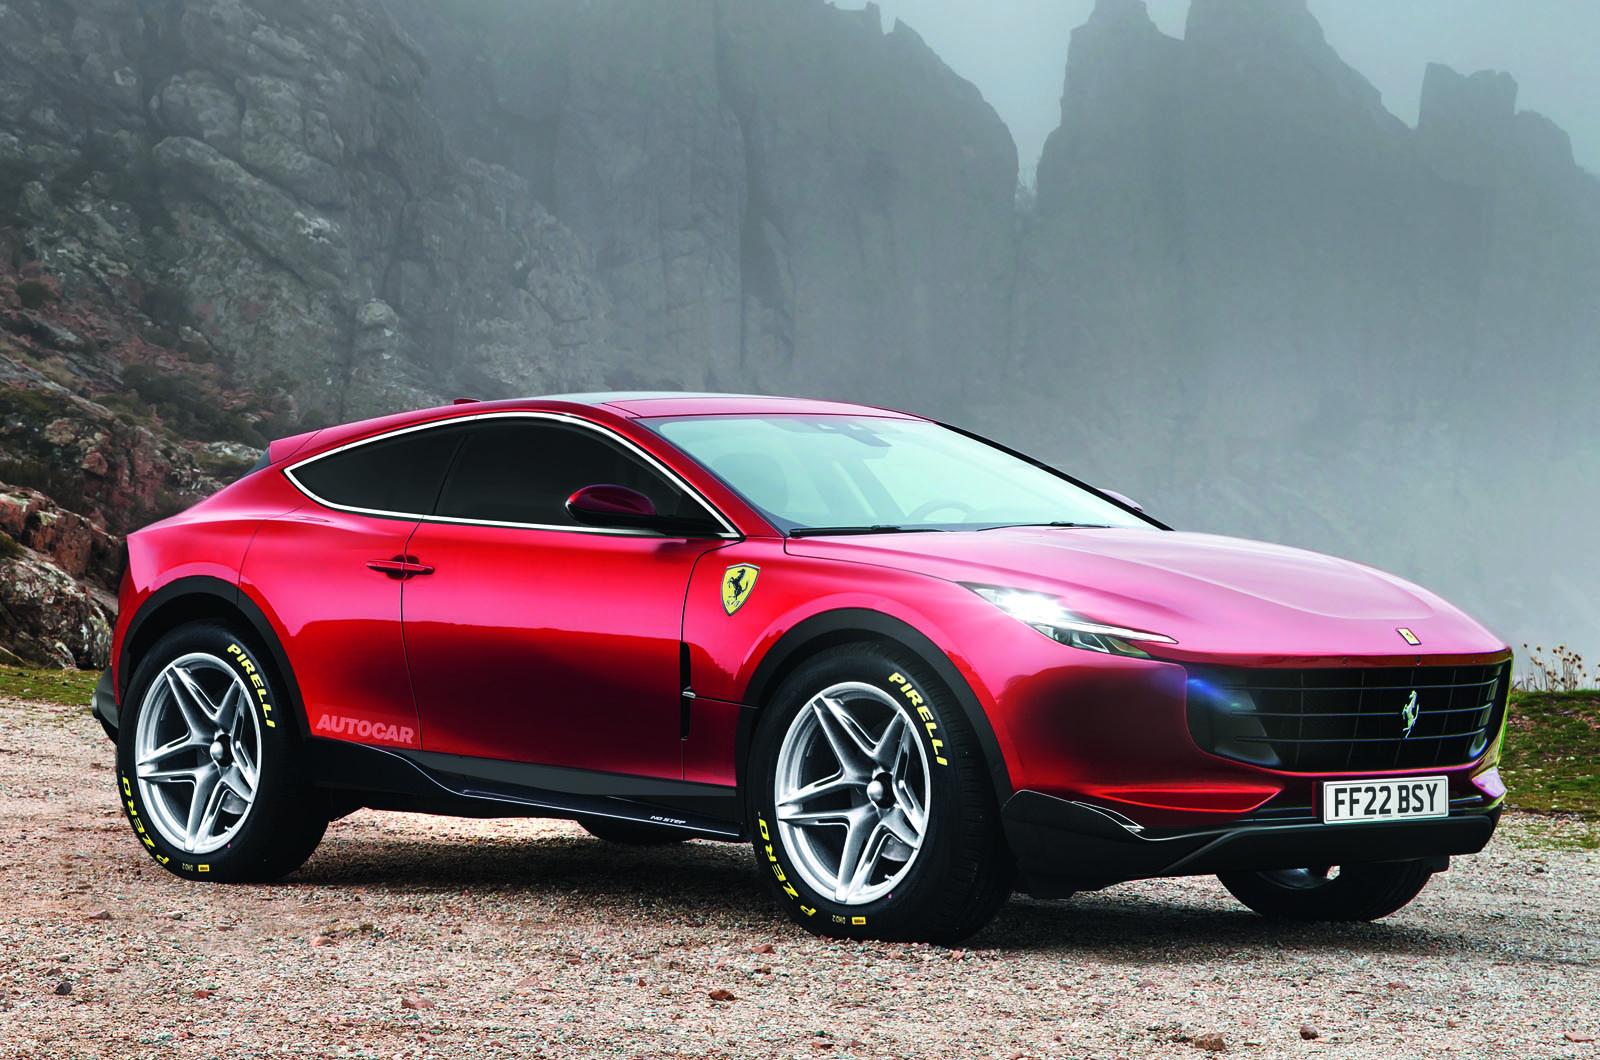 Ferrari S 2022 Performance Suv Begins Track Tests Autocar